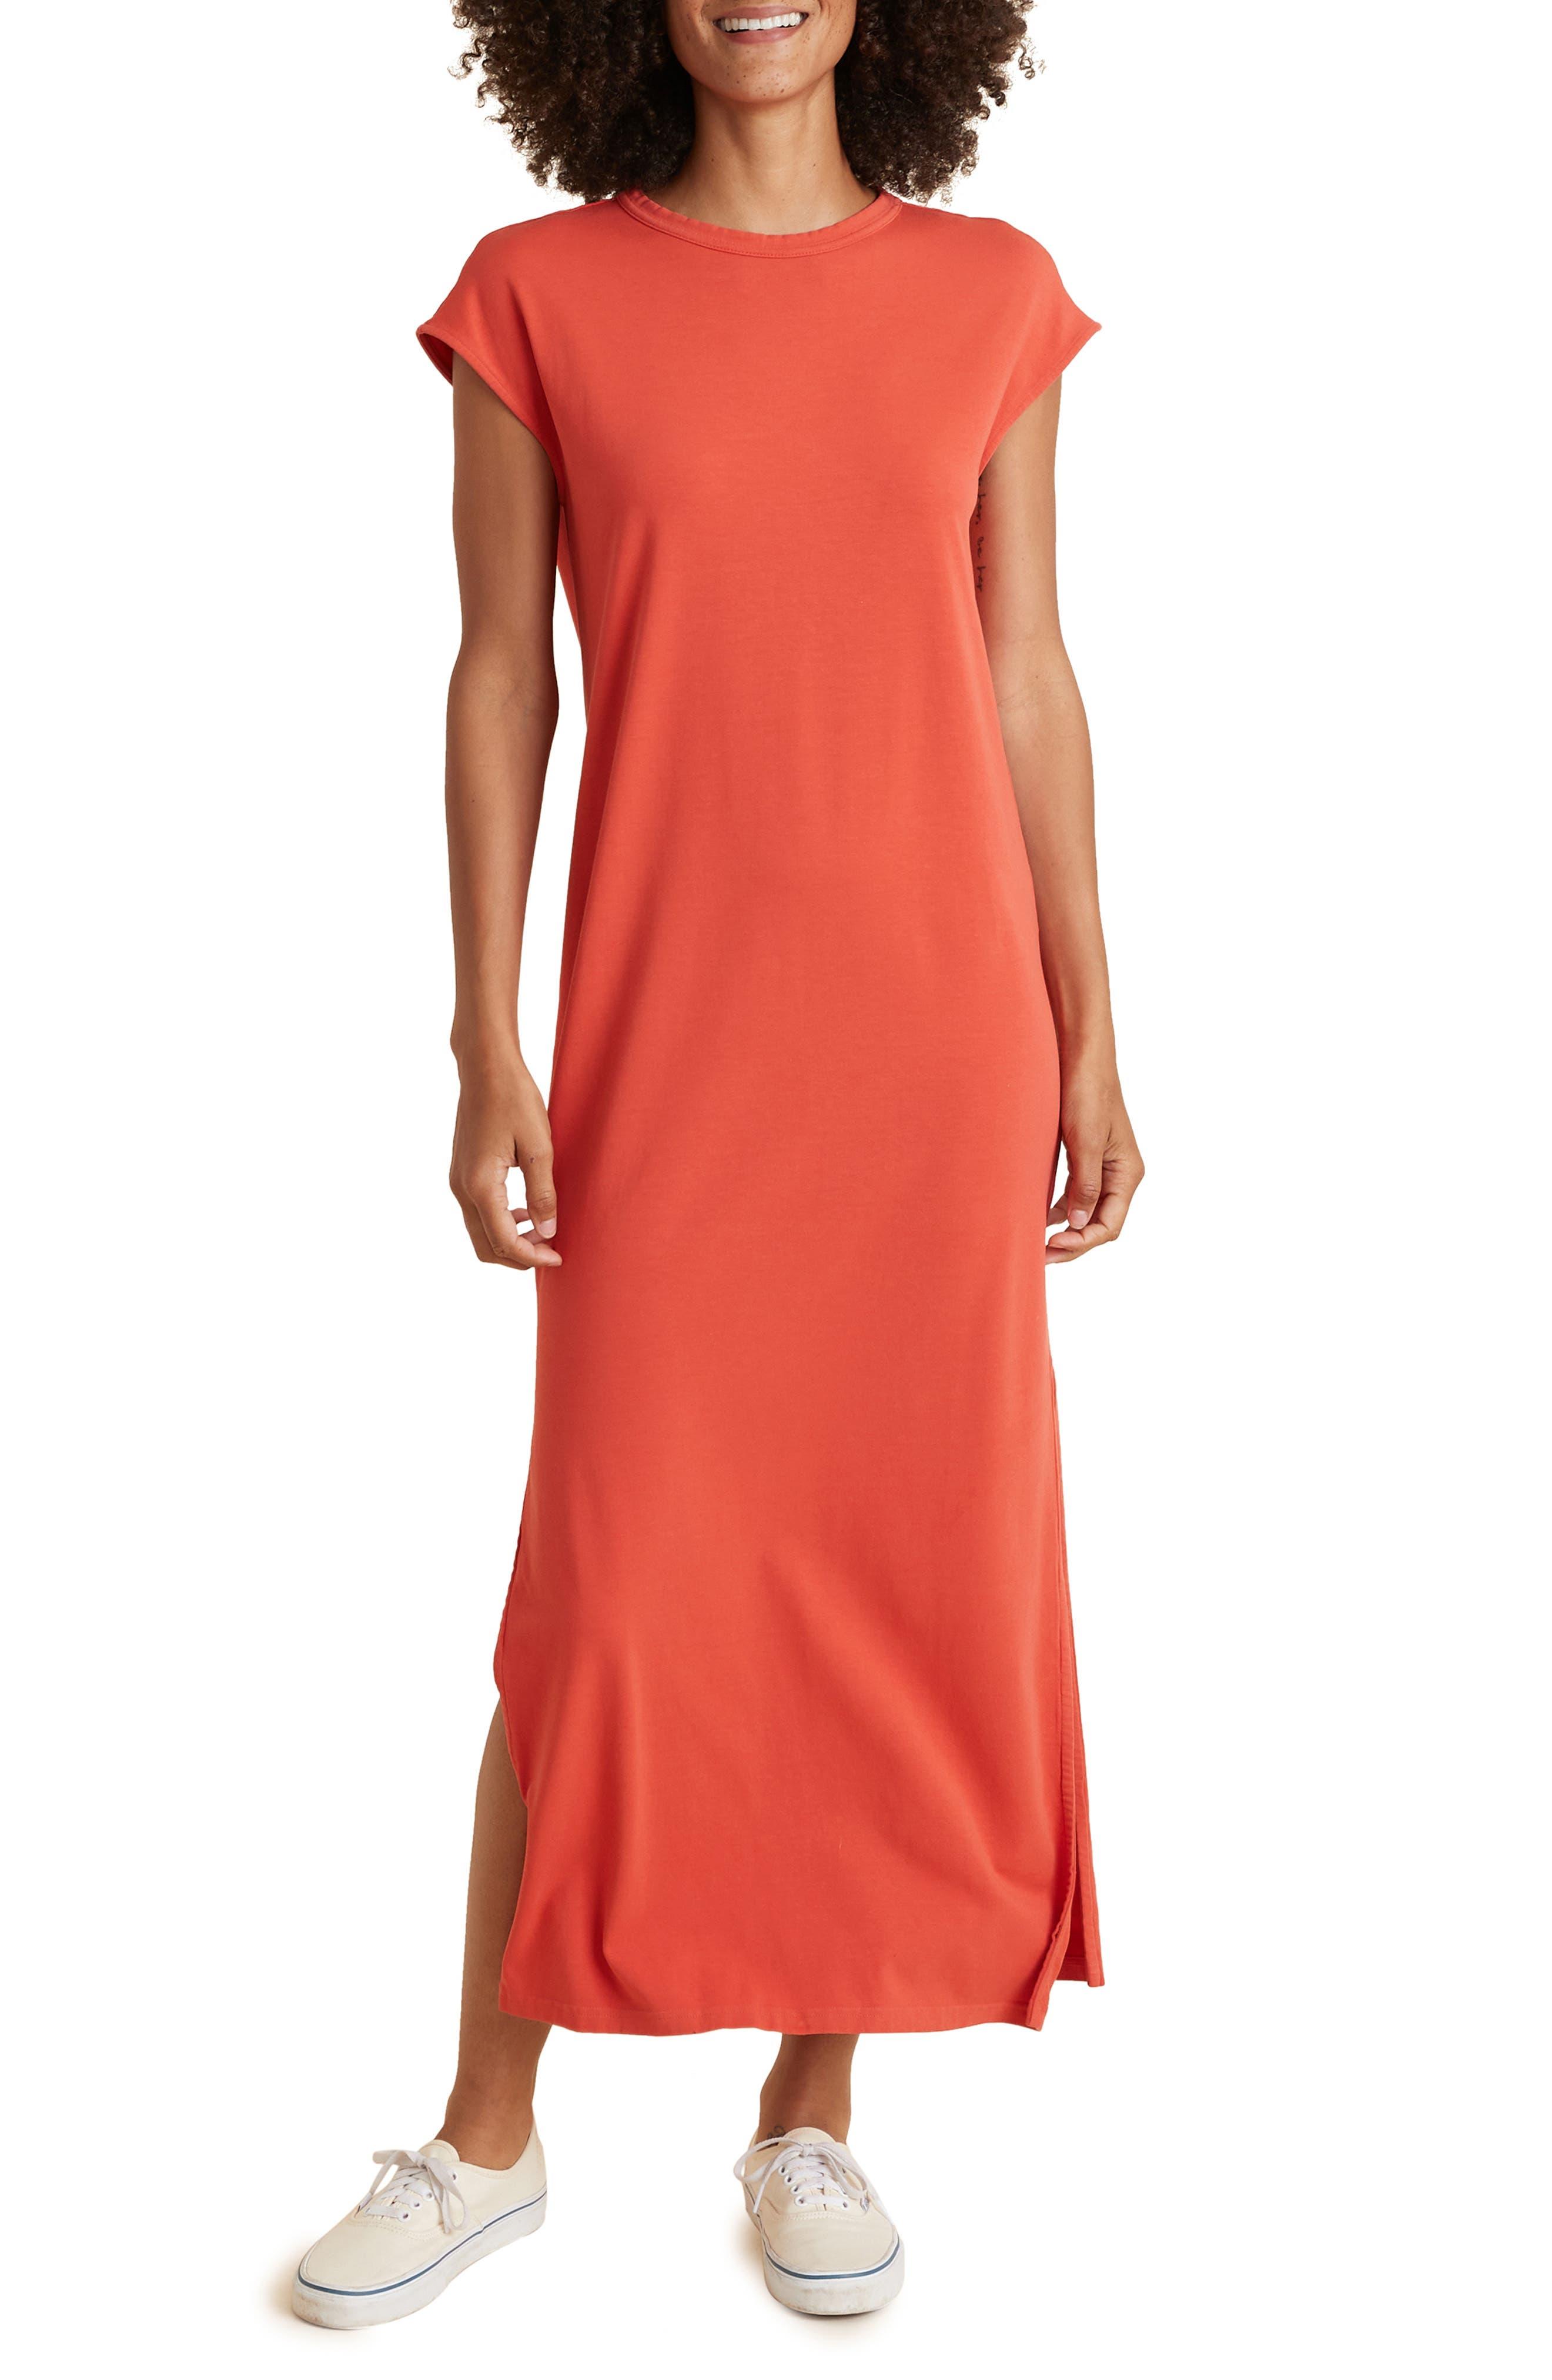 Taylor Organic Cotton & Modal Stretch Knit Maxi Dress